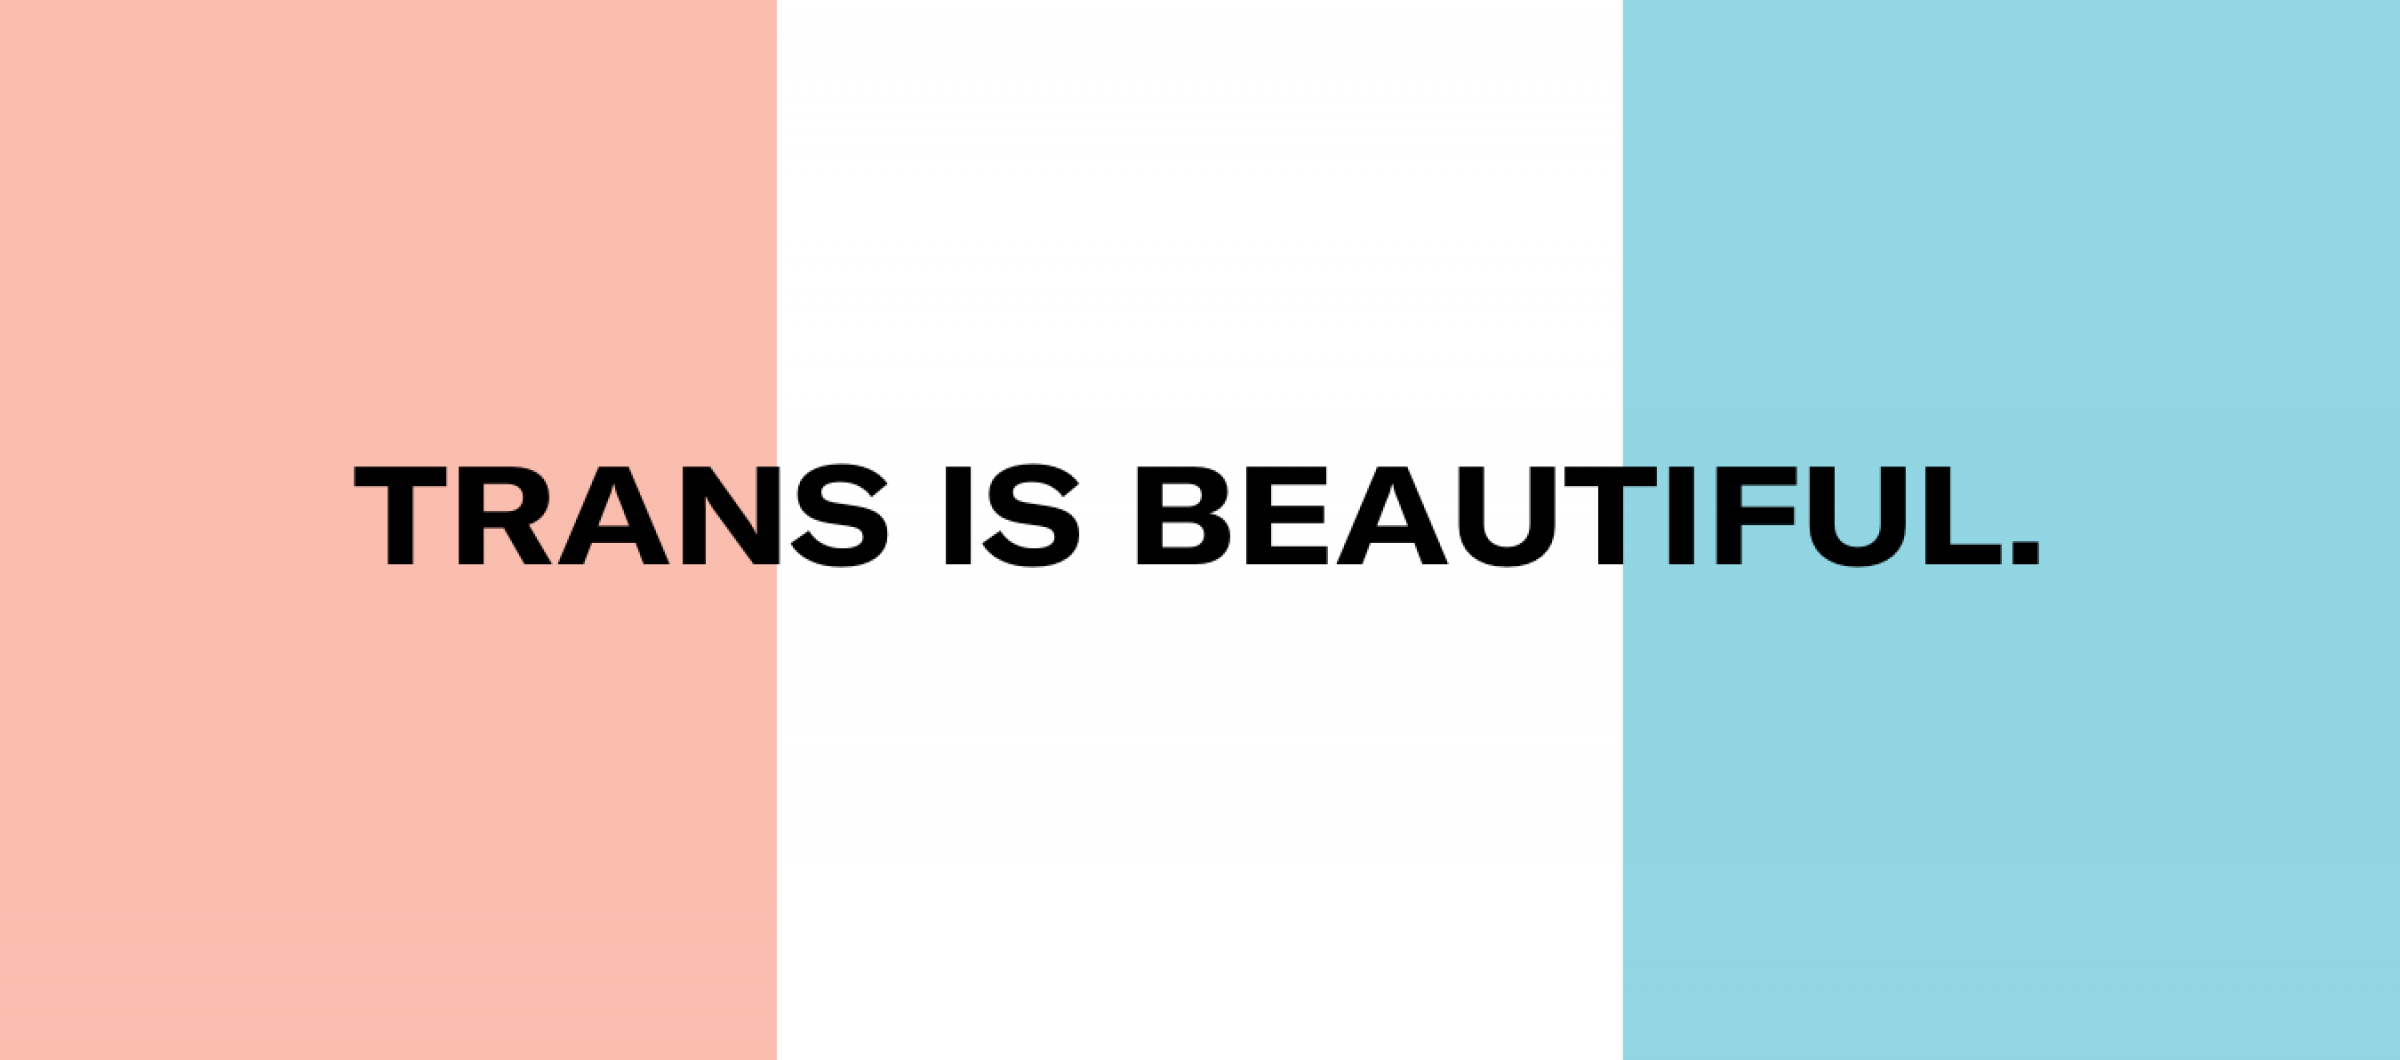 Trans is beautiful | aclu-ms.org